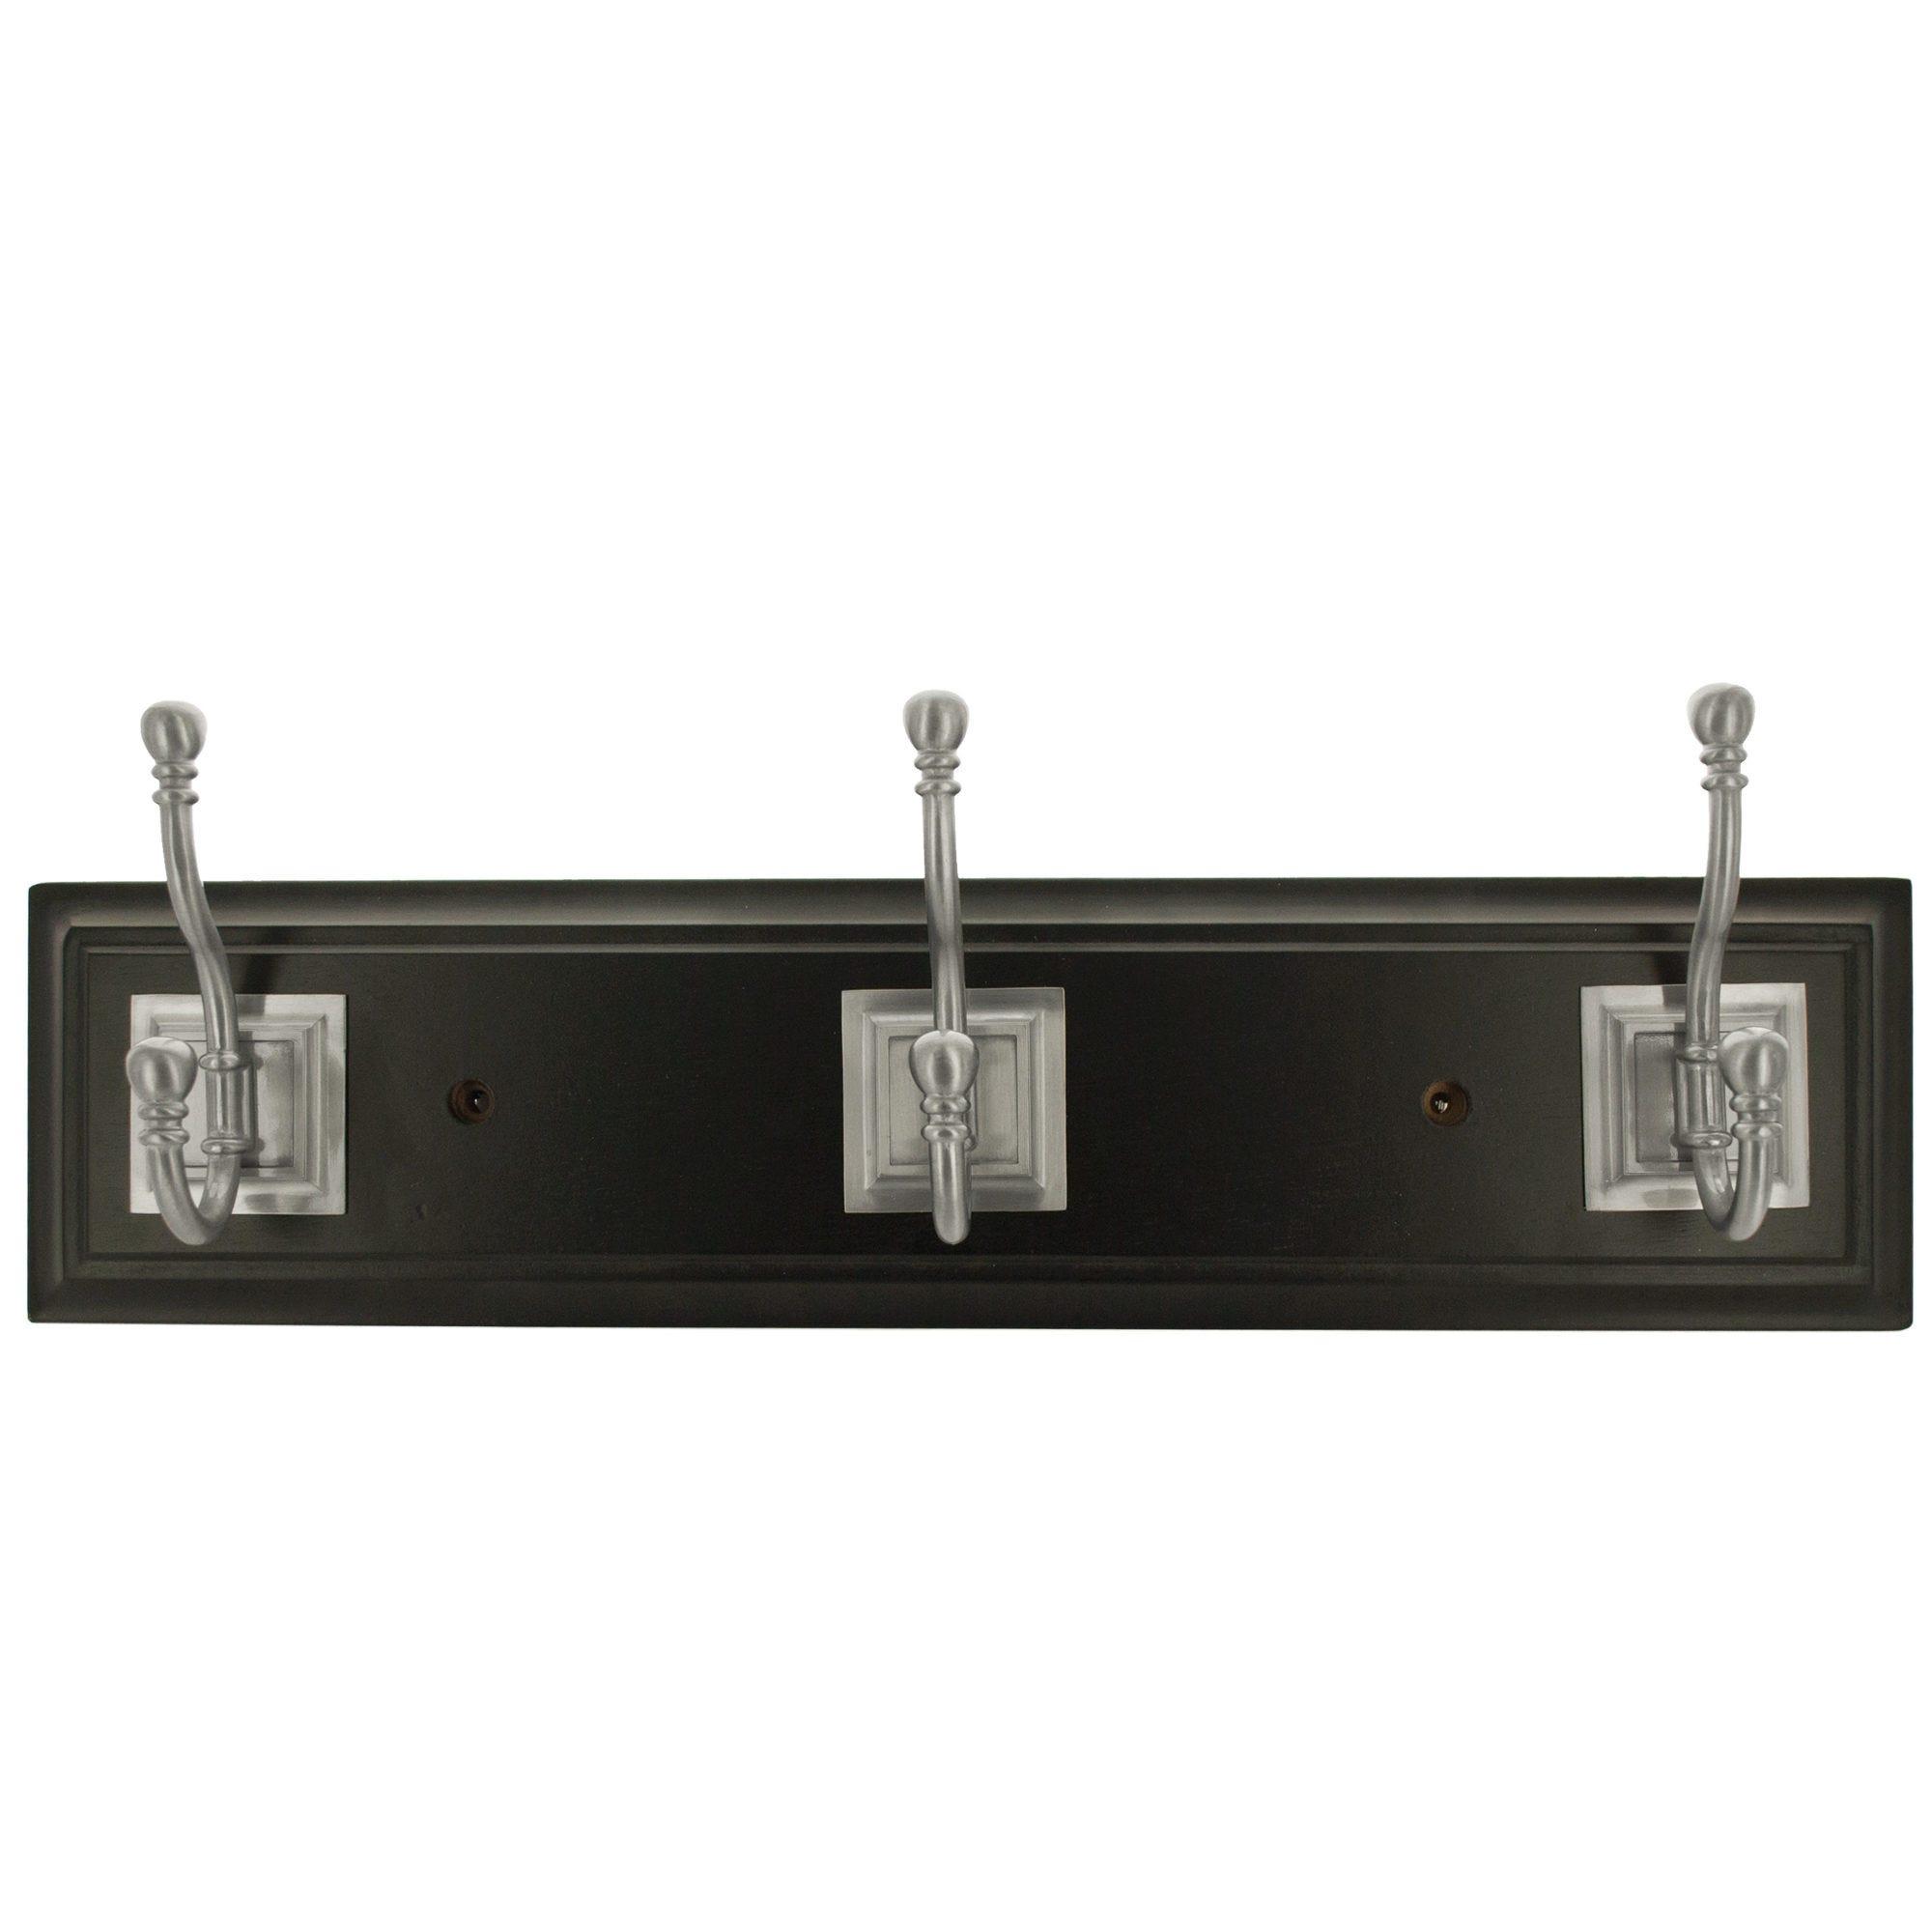 Franklin Brass Black & Satin Nickel Architectural Hook Rail- Qty 4